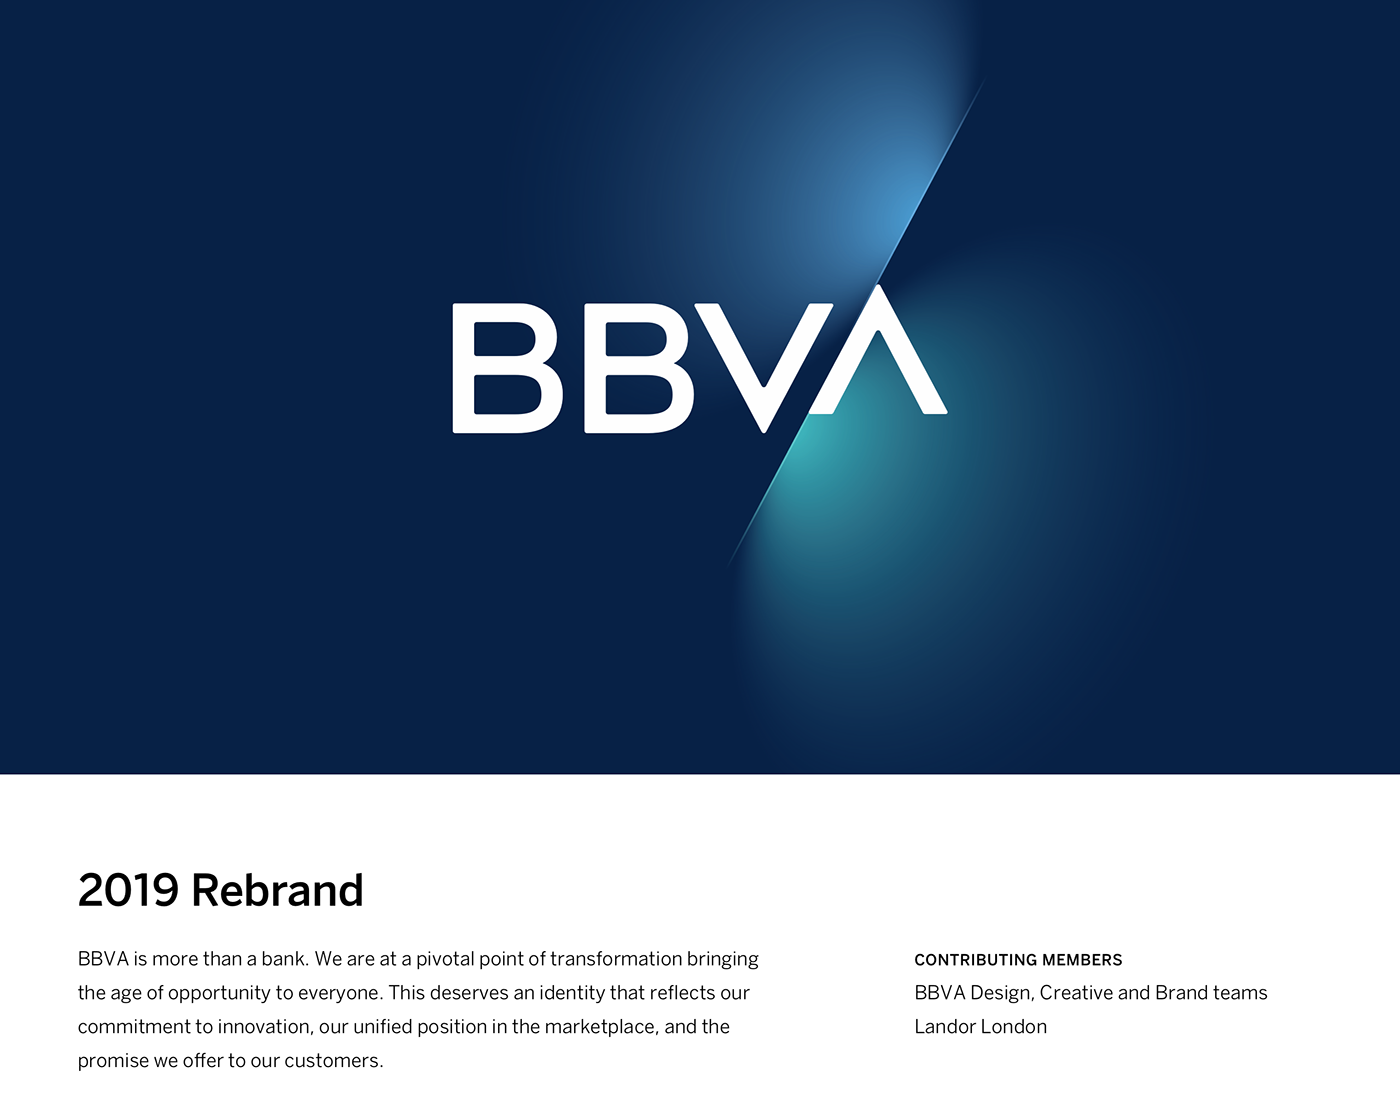 BBVA Diseño Corporativo 2019